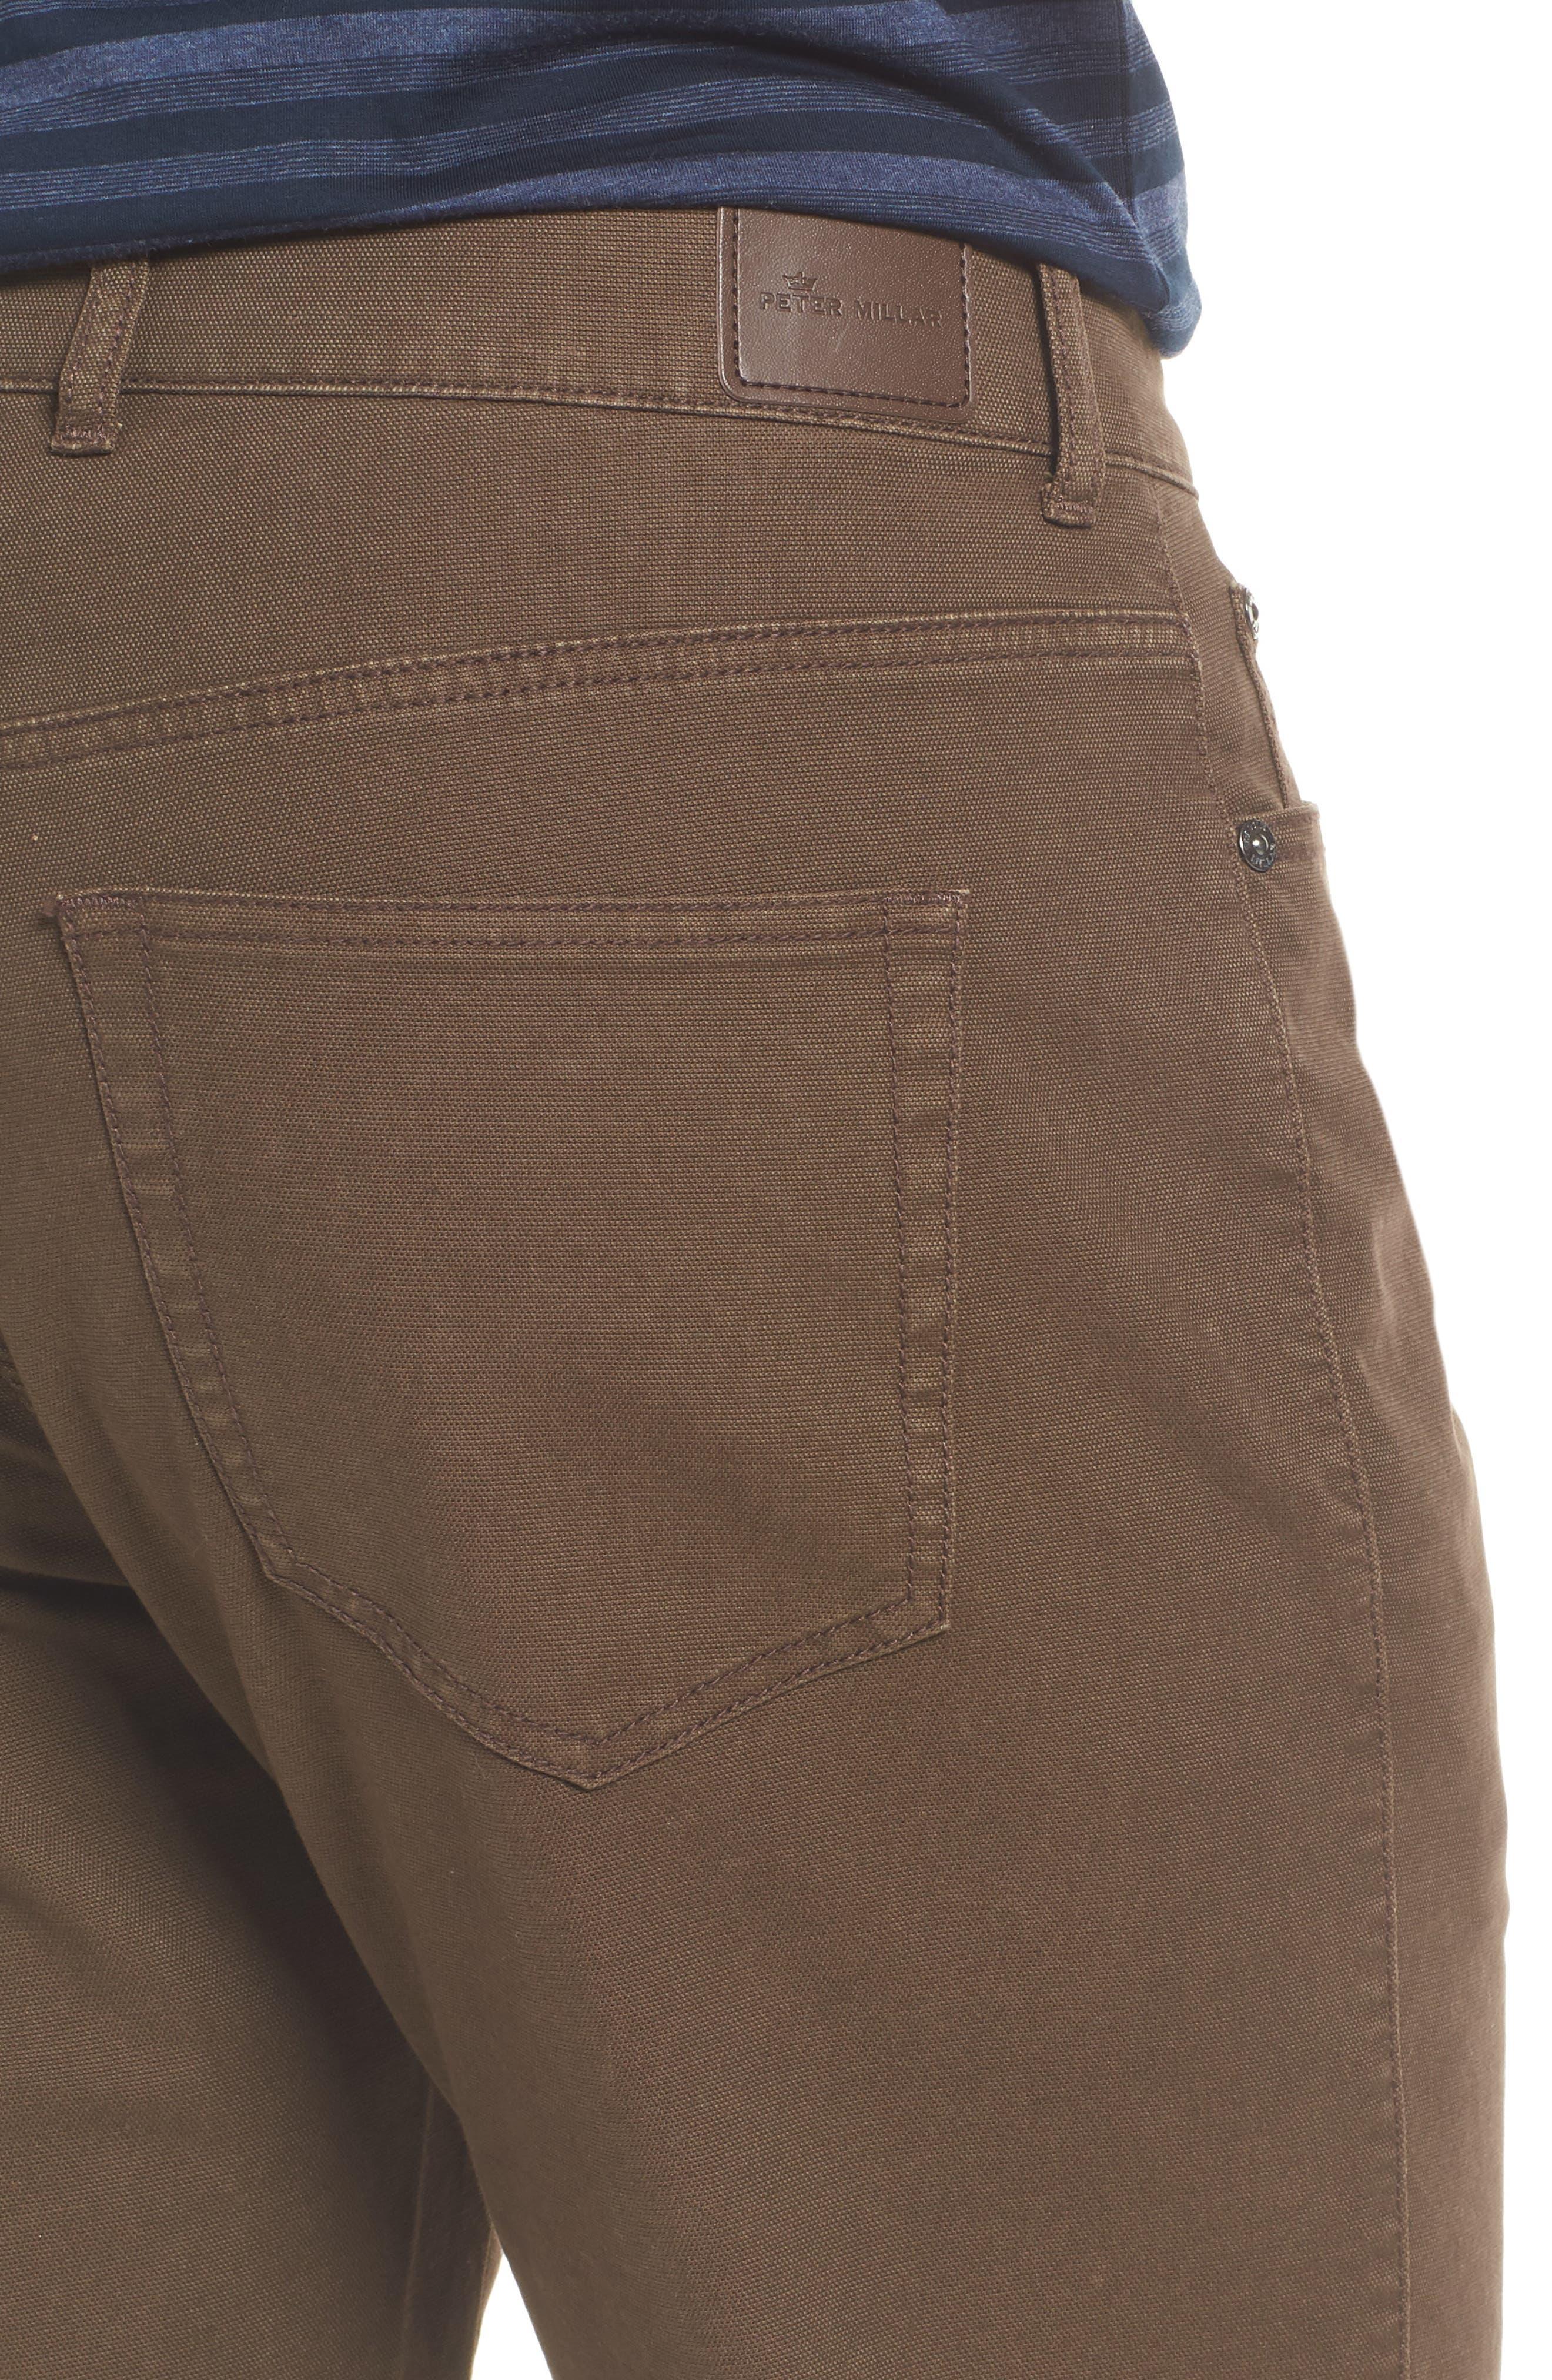 Crown Vintage Canvas Pants,                             Alternate thumbnail 4, color,                             CANOPY BROWN